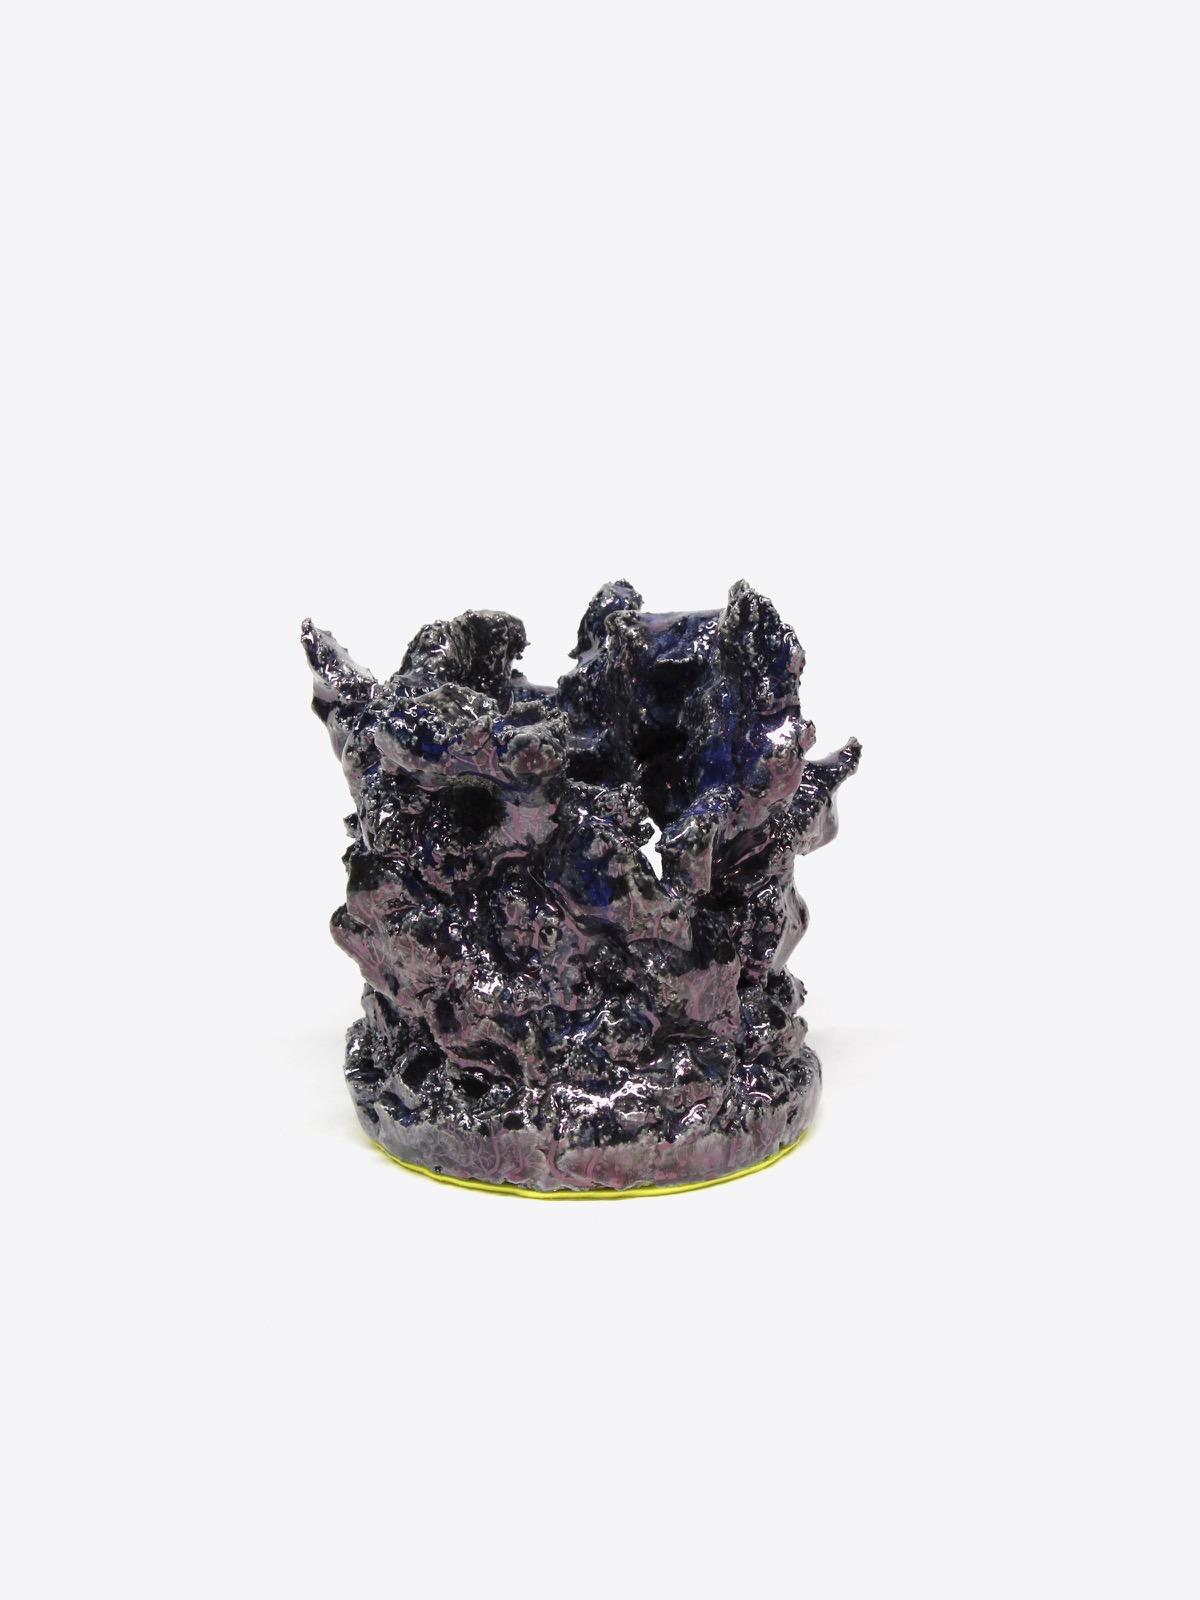 david rauer vinyl puck - david rauer | 031